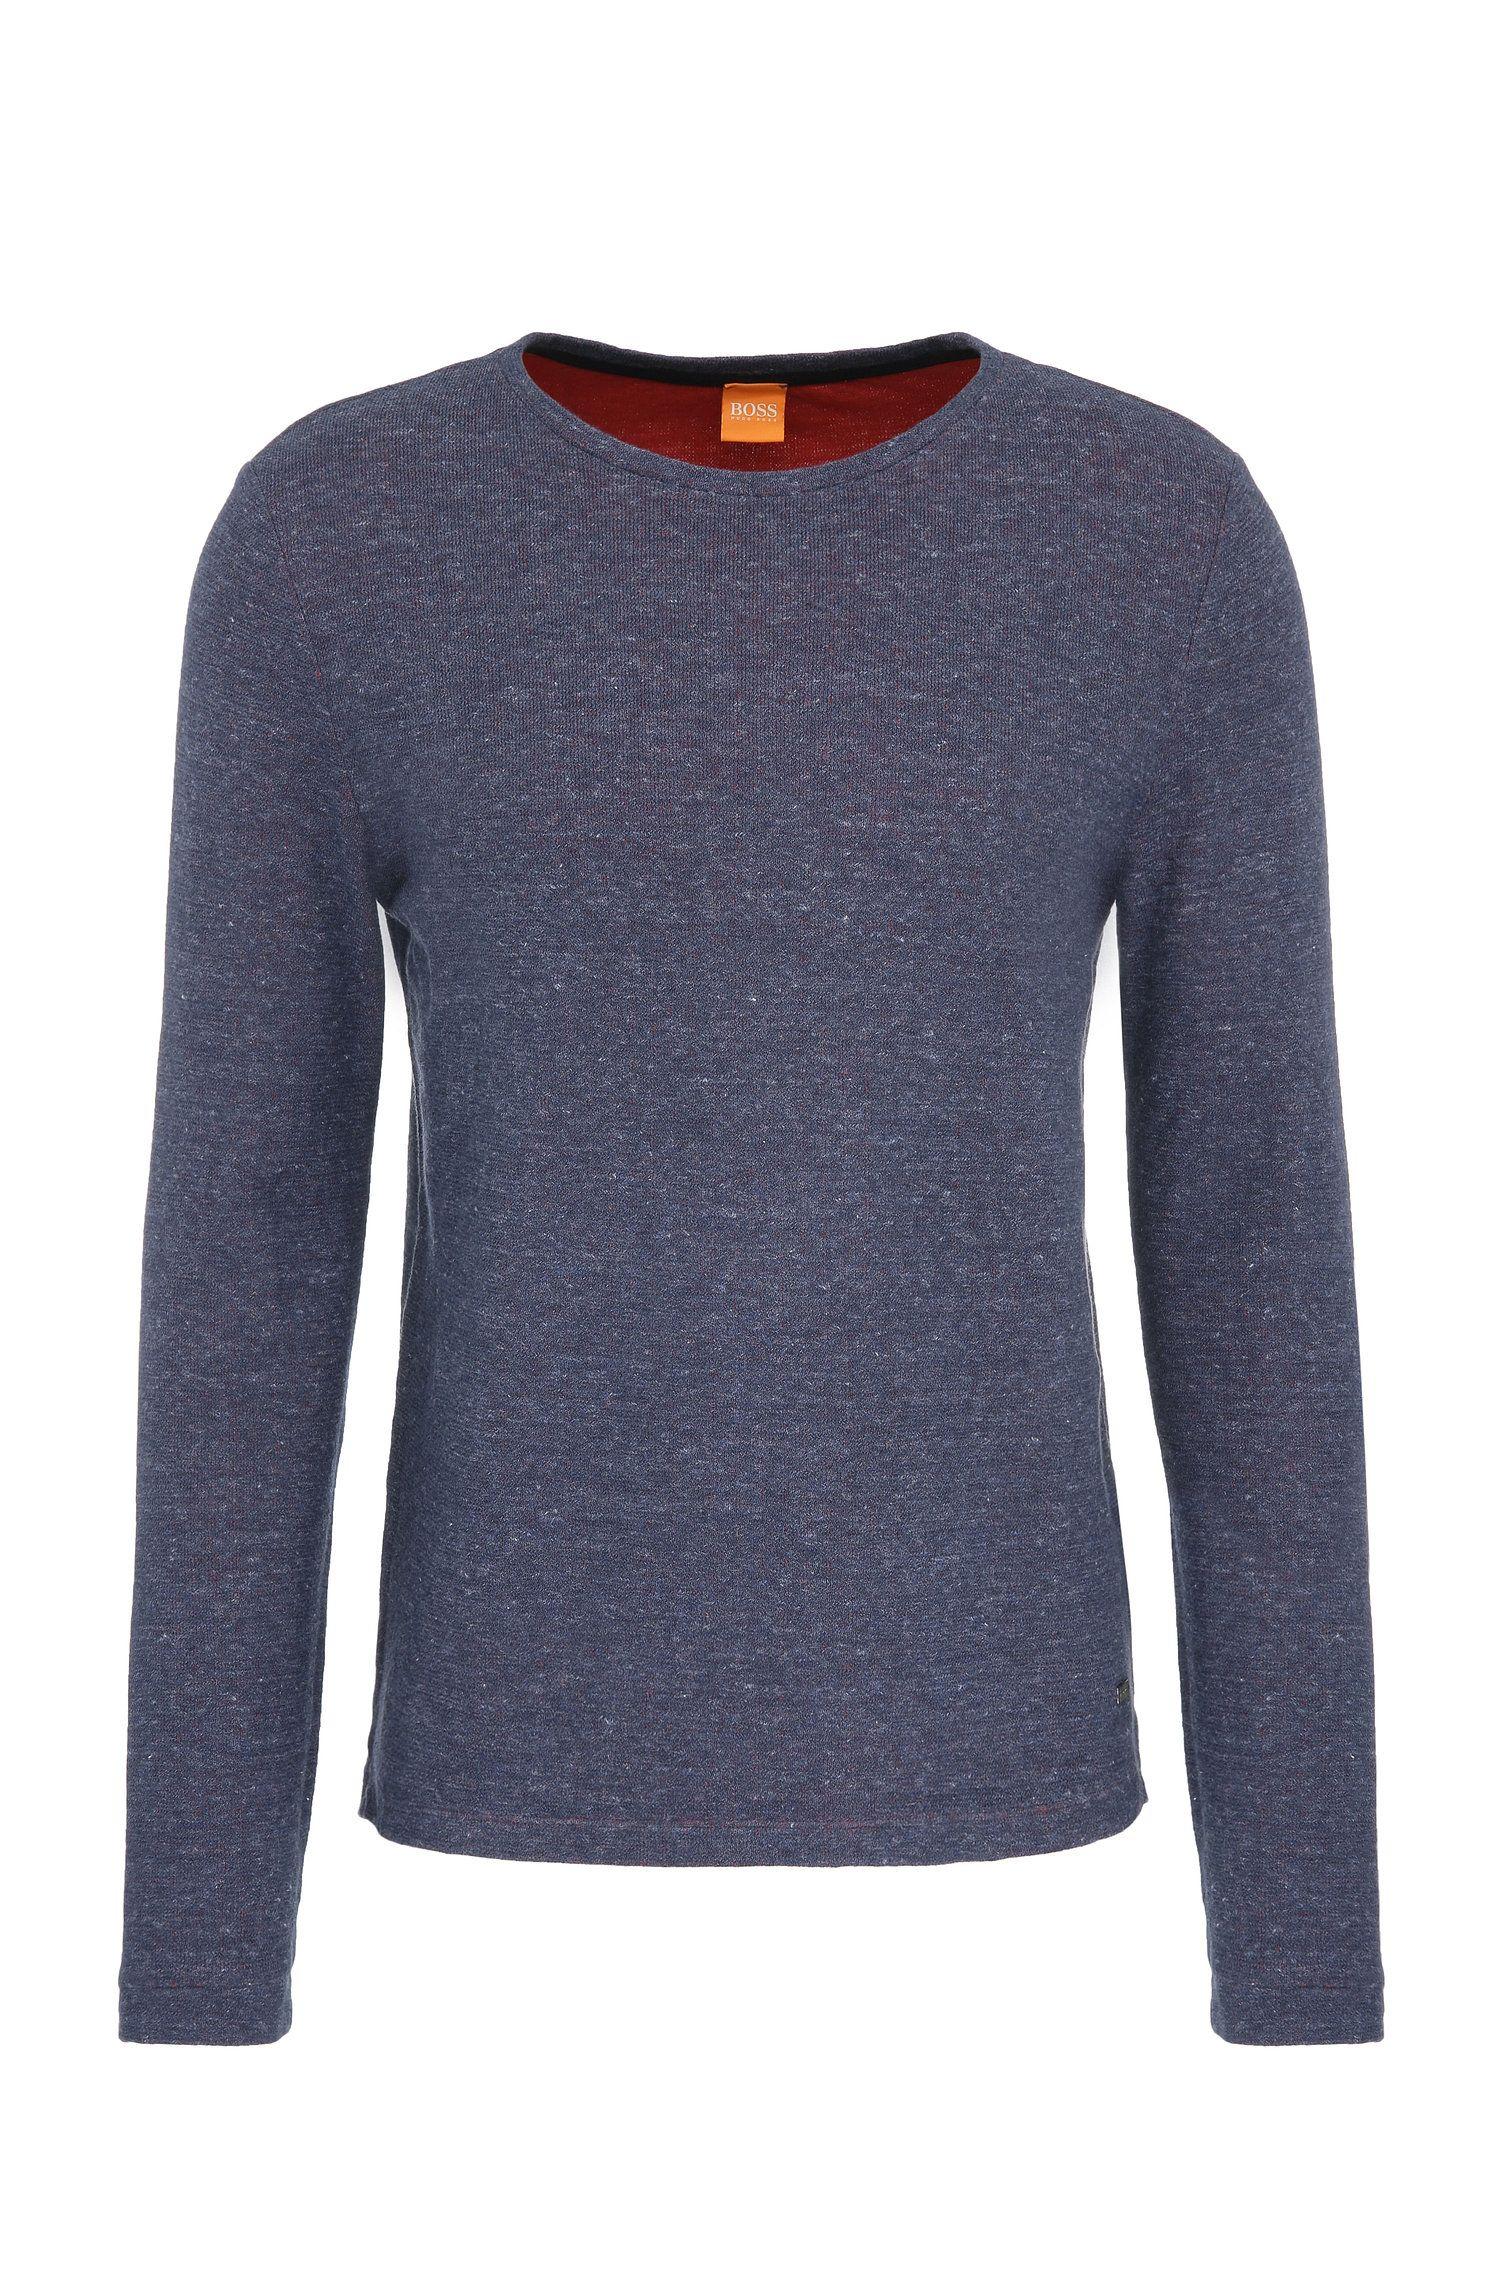 Camiseta de manga larga jaspeada slim fit en algodón: 'Wanna'